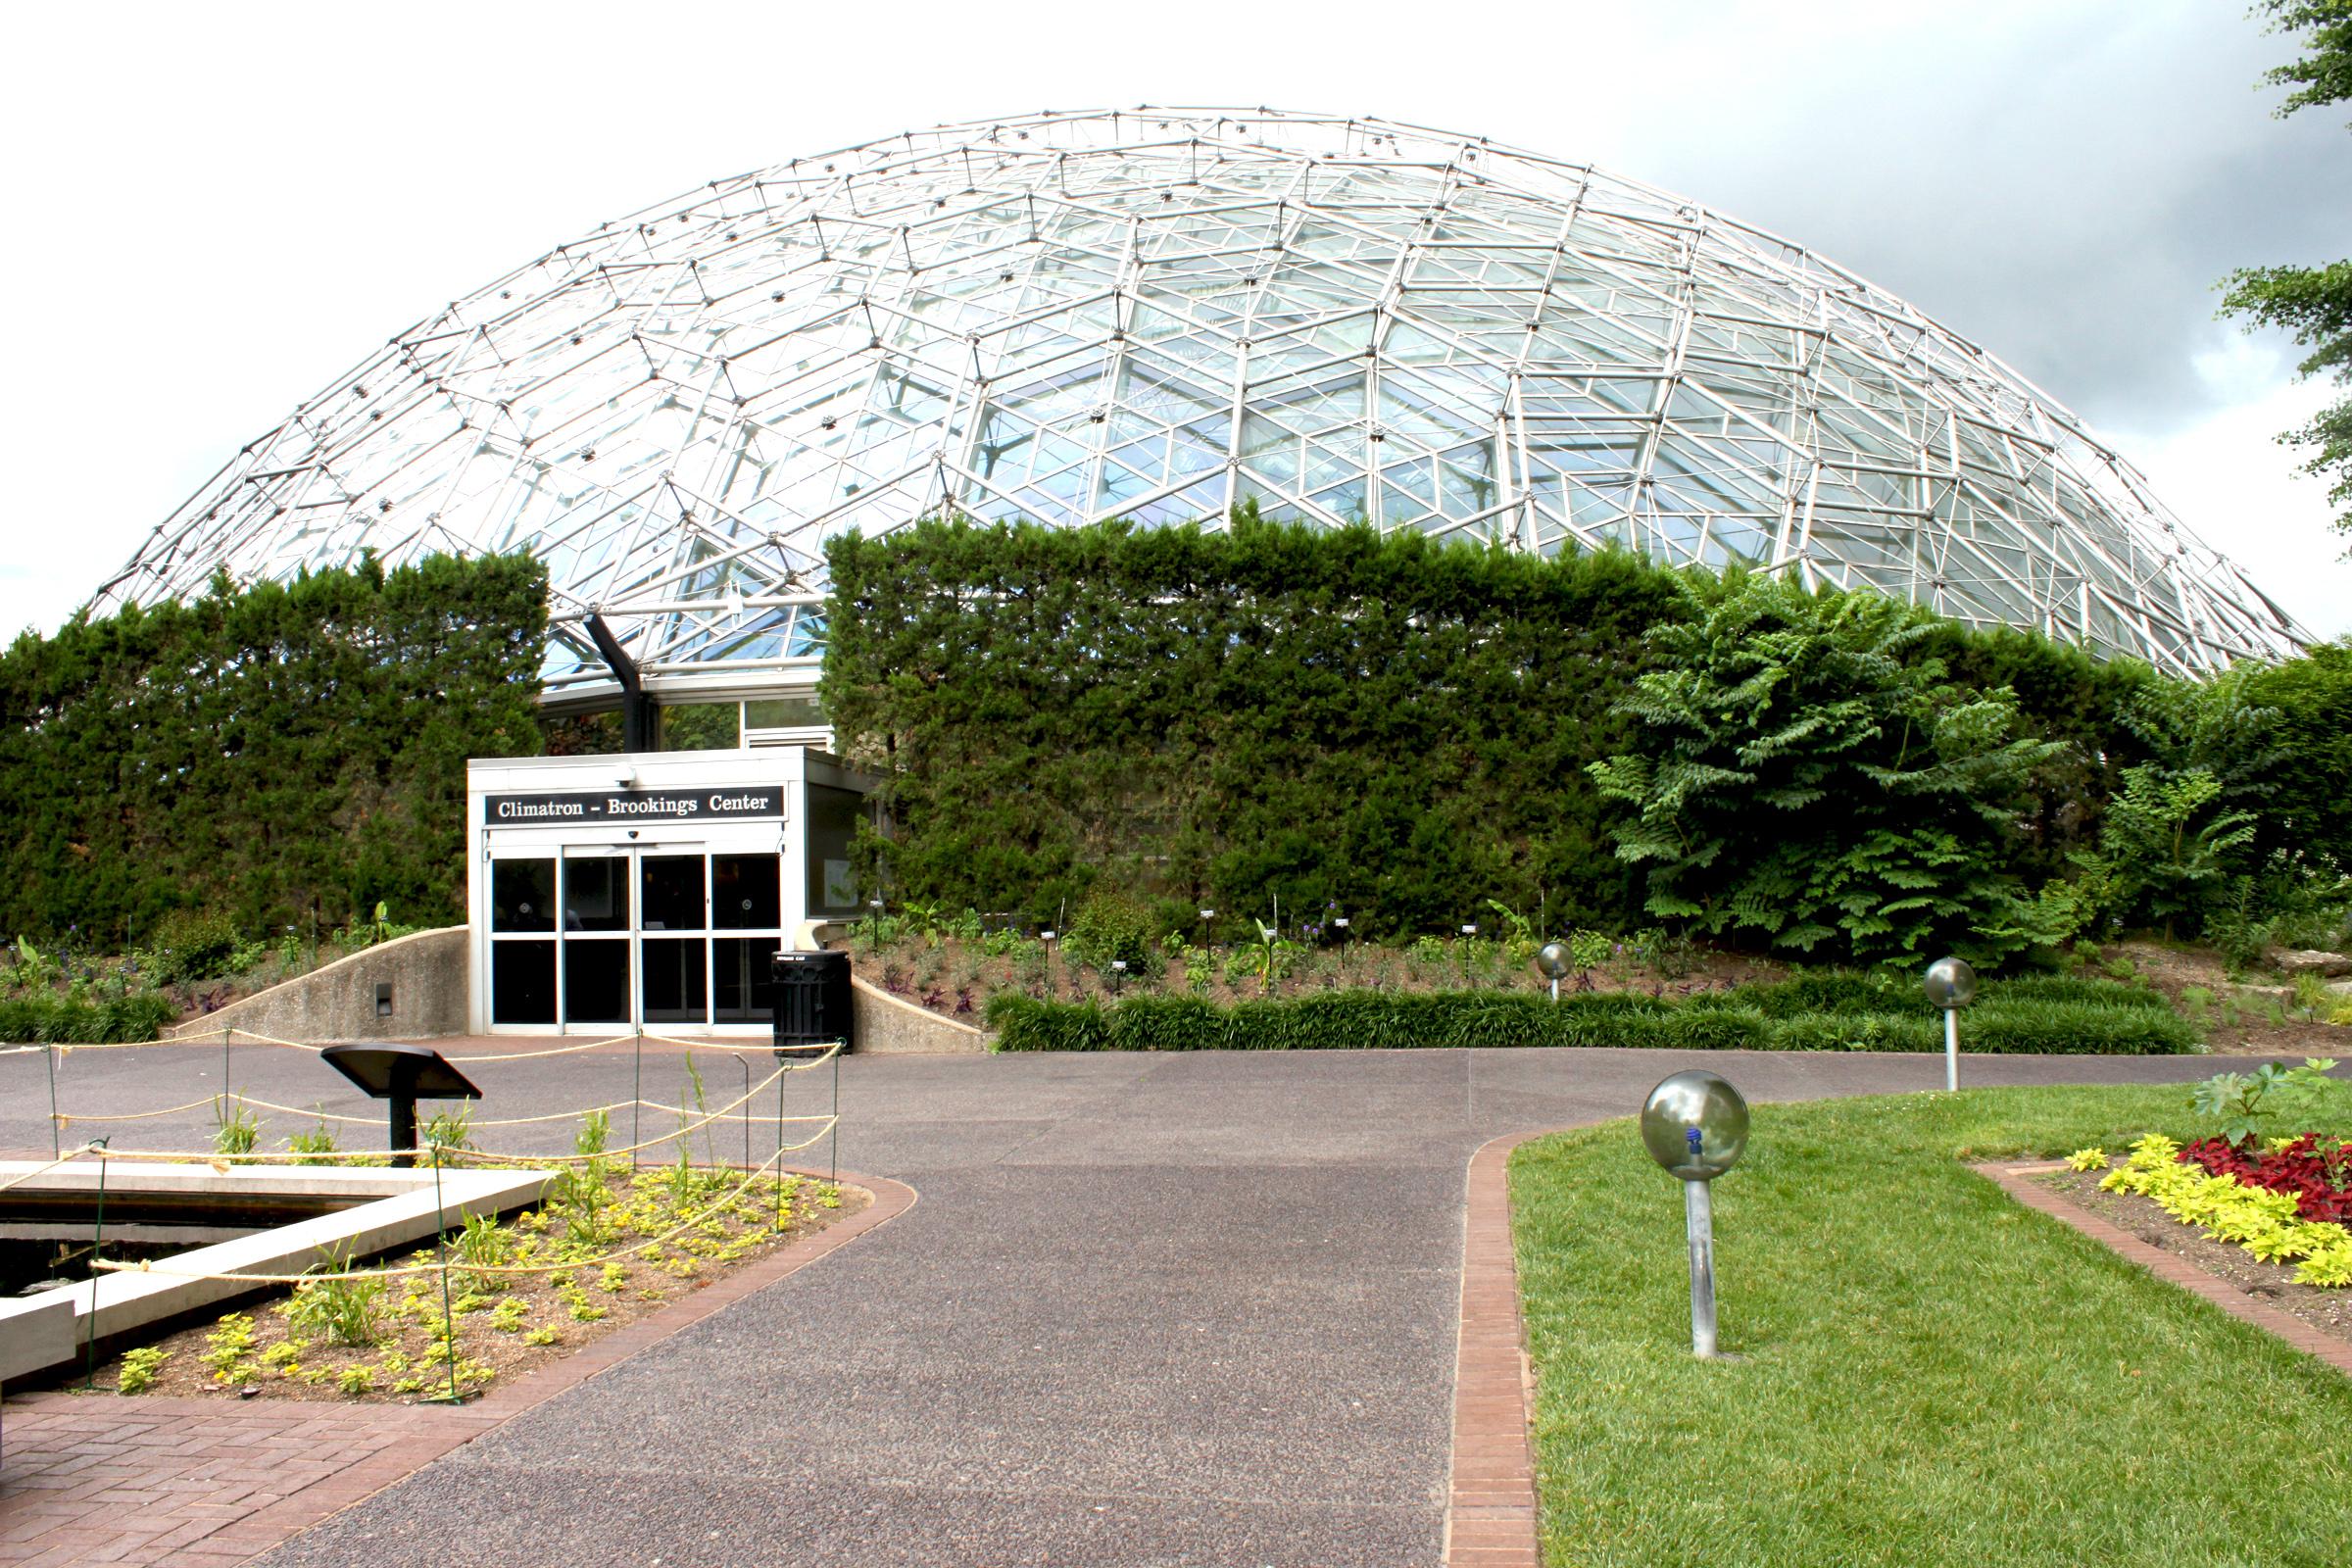 Climatron, Missouri Botanical Garden